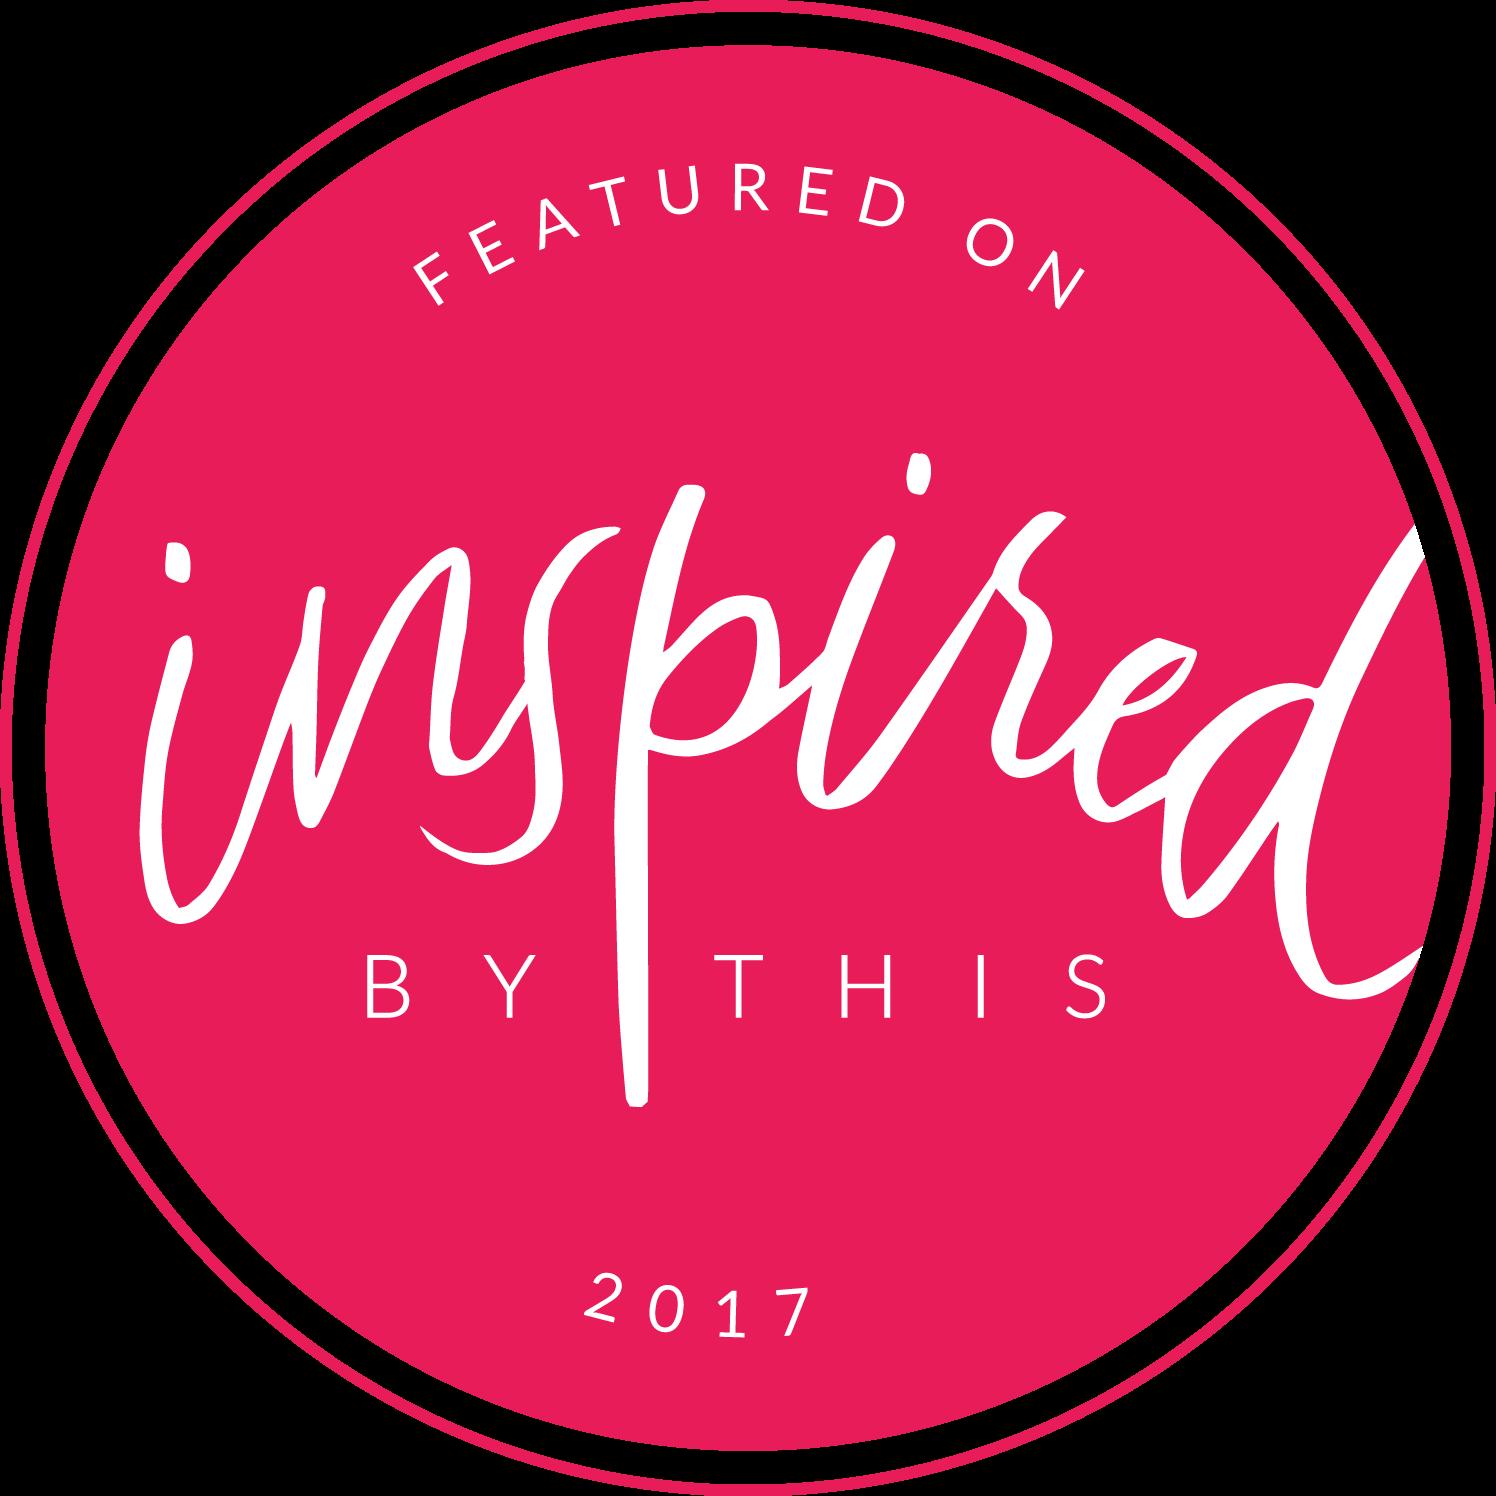 IBT_Badge2017_Pink_RGB.jpg